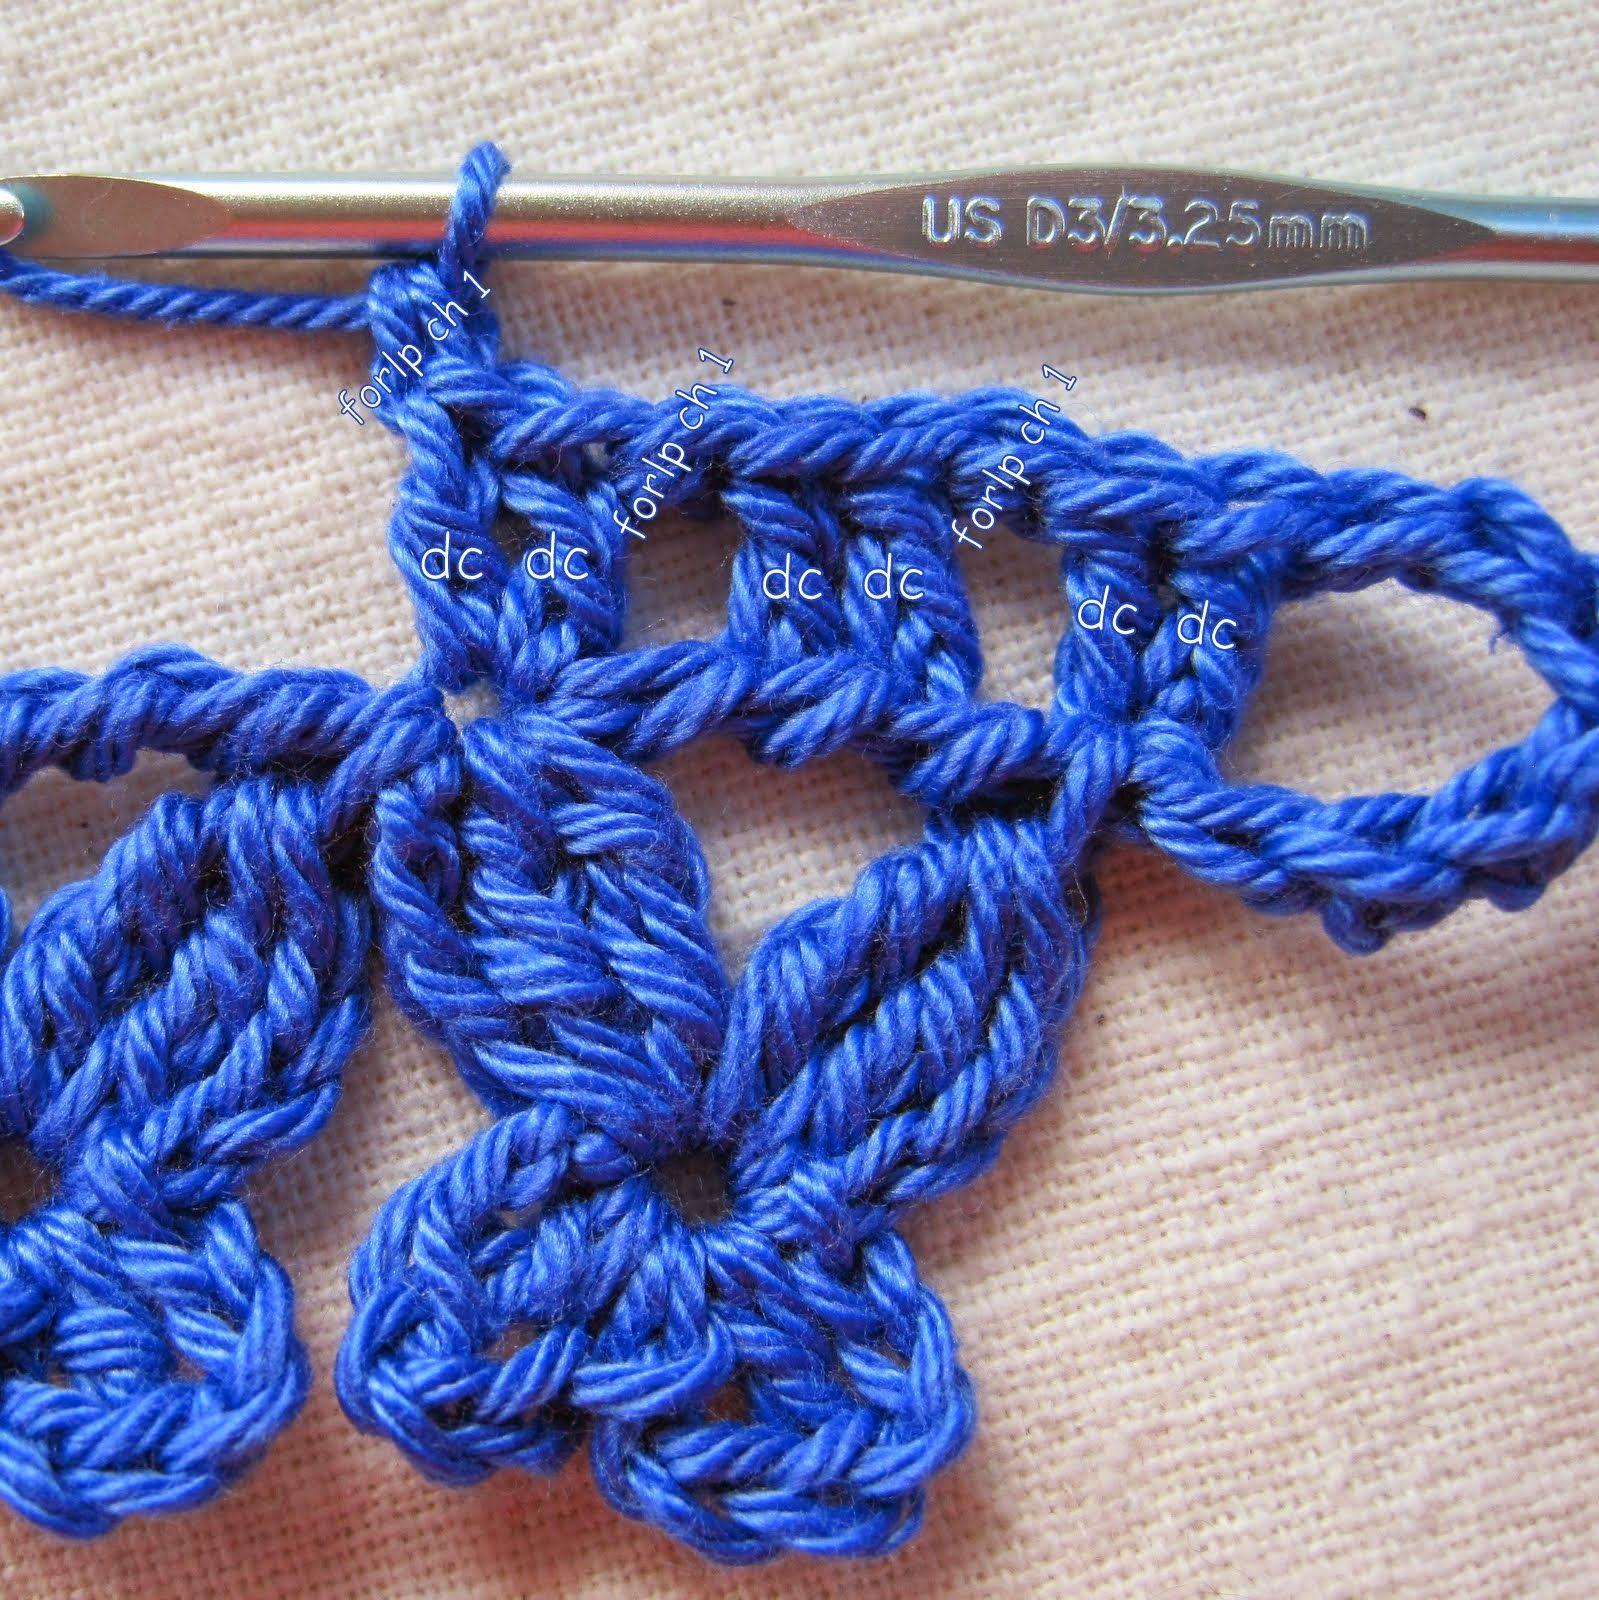 How to tie crochet motifs